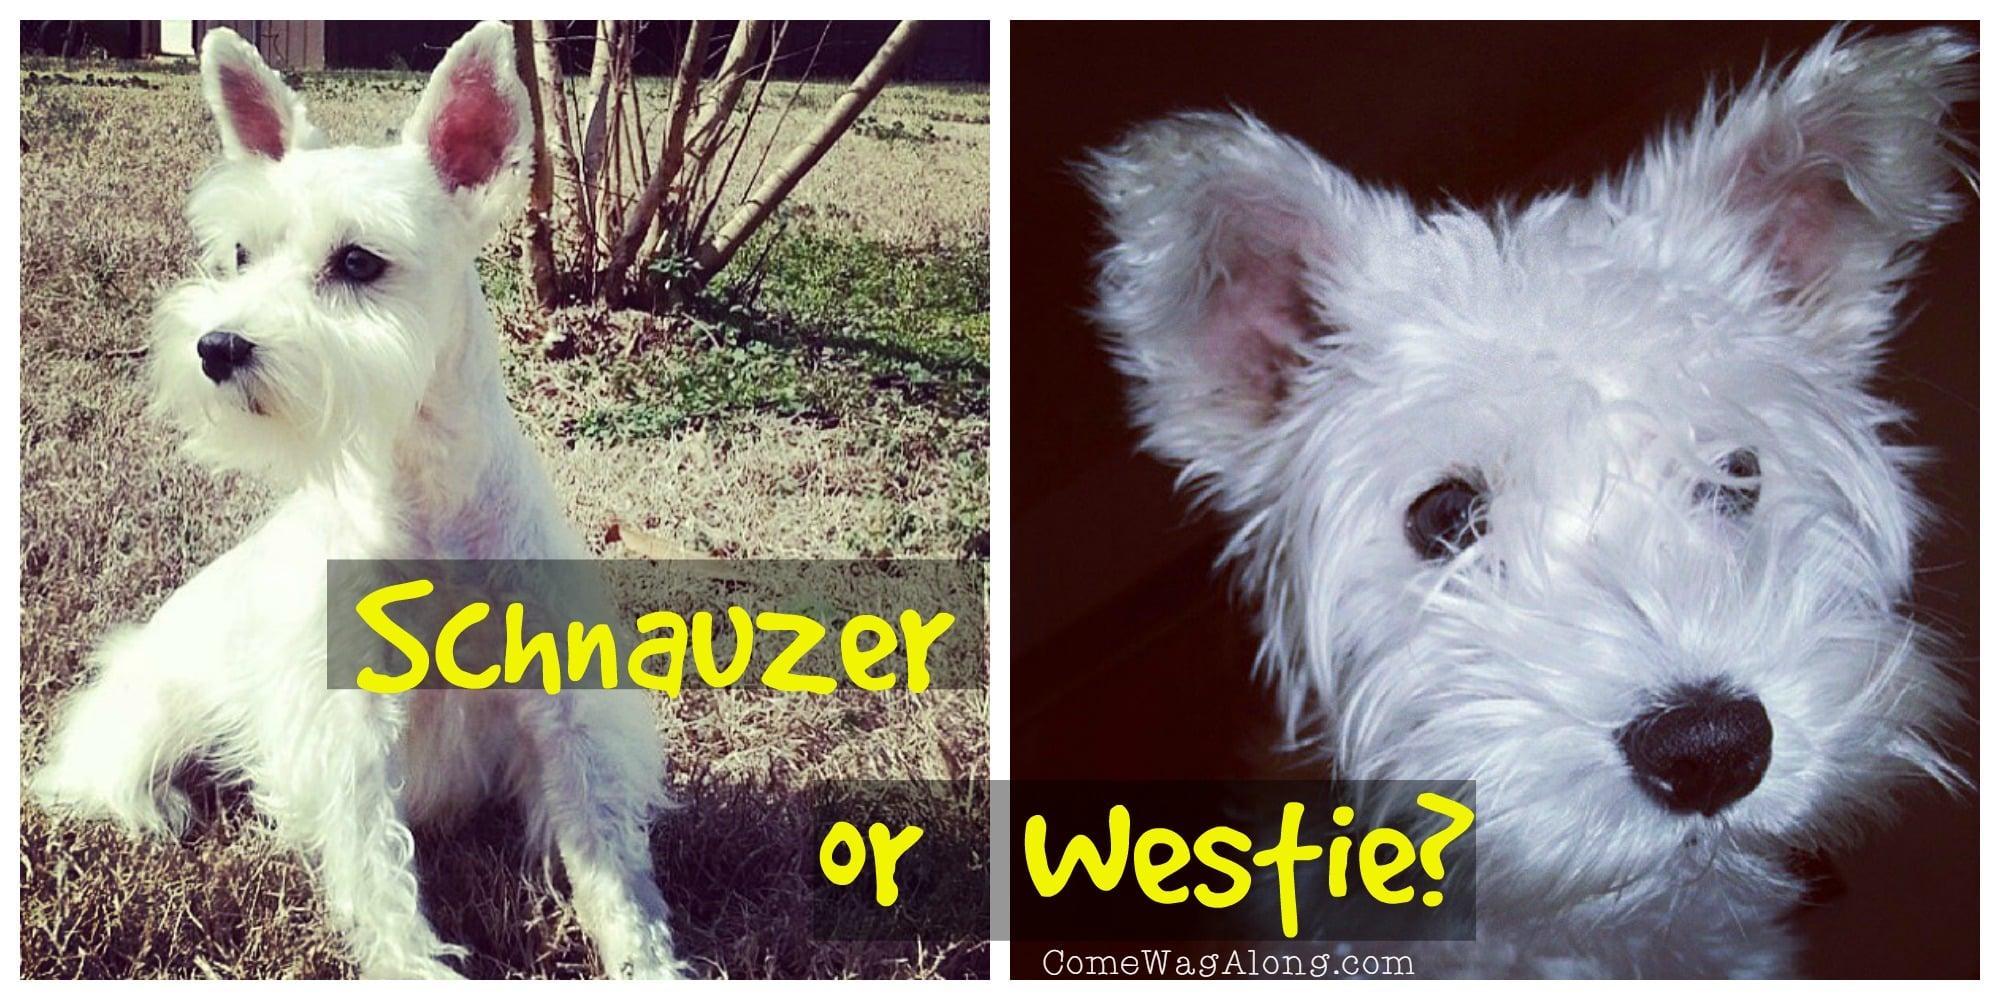 Schnauzer or Westie